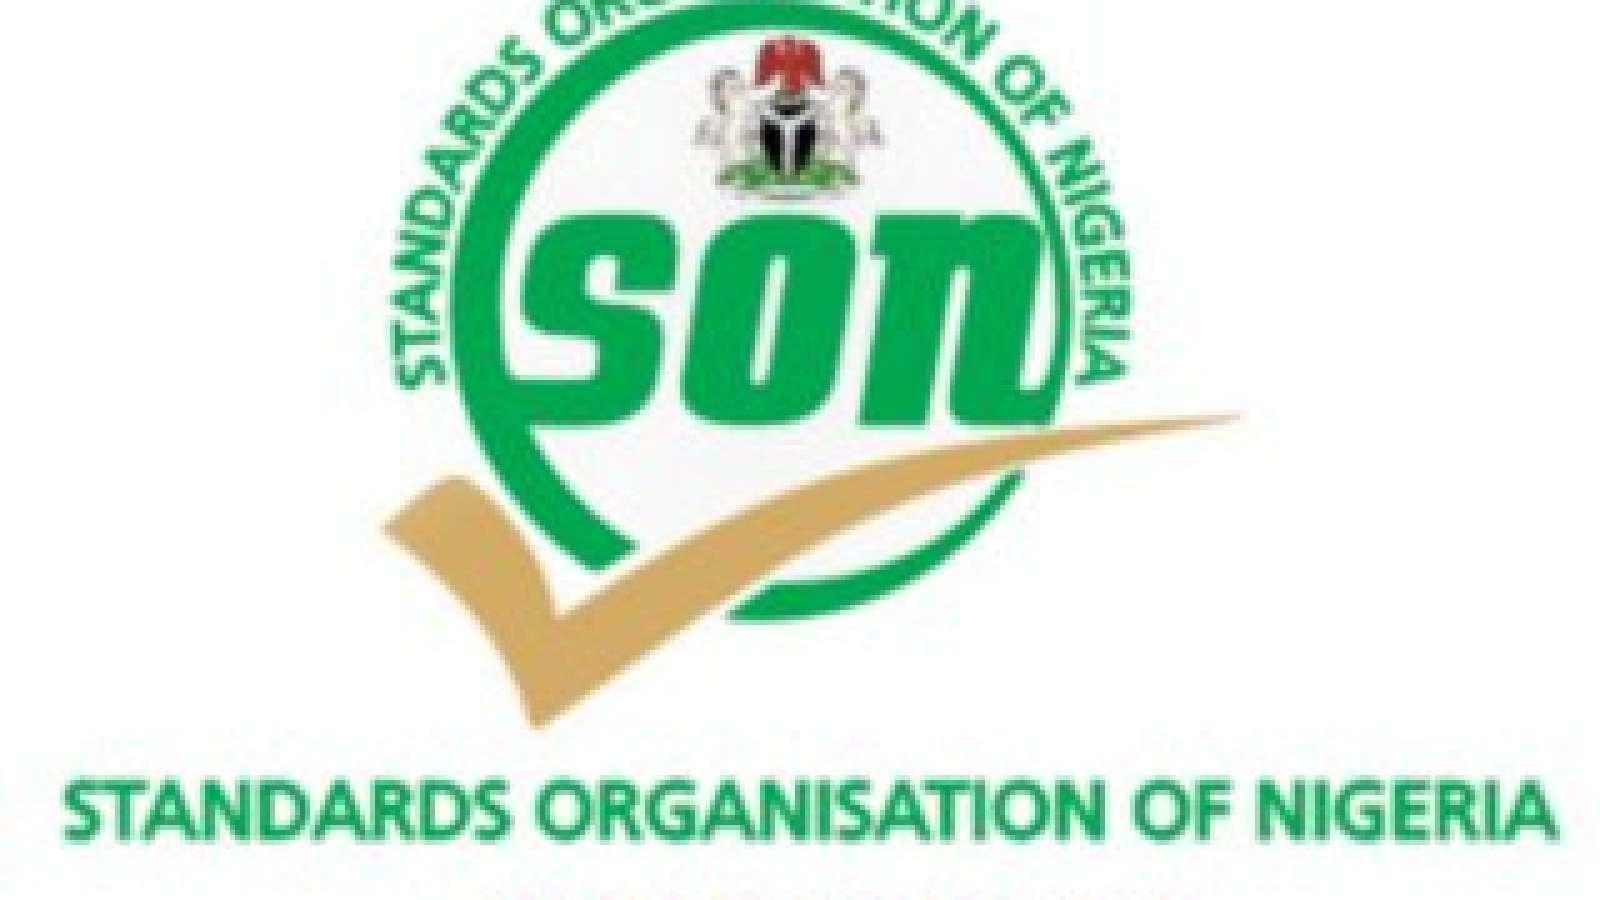 Standards Organisation of Nigeria SON